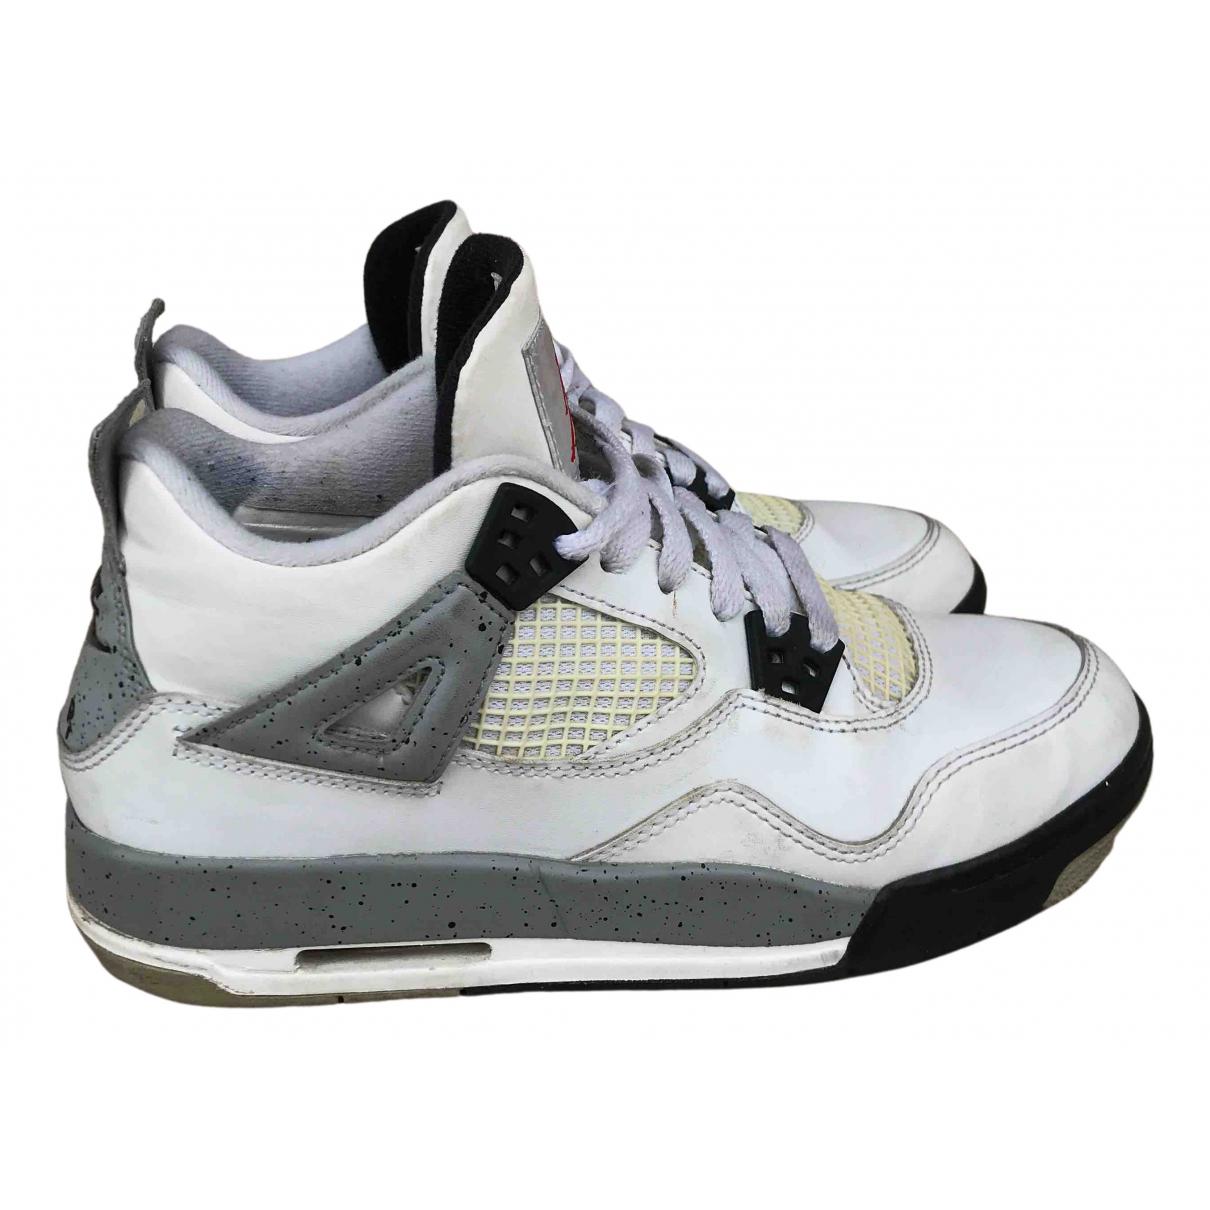 Jordan Air Jordan 4 White Leather Trainers for Women 5.5 US